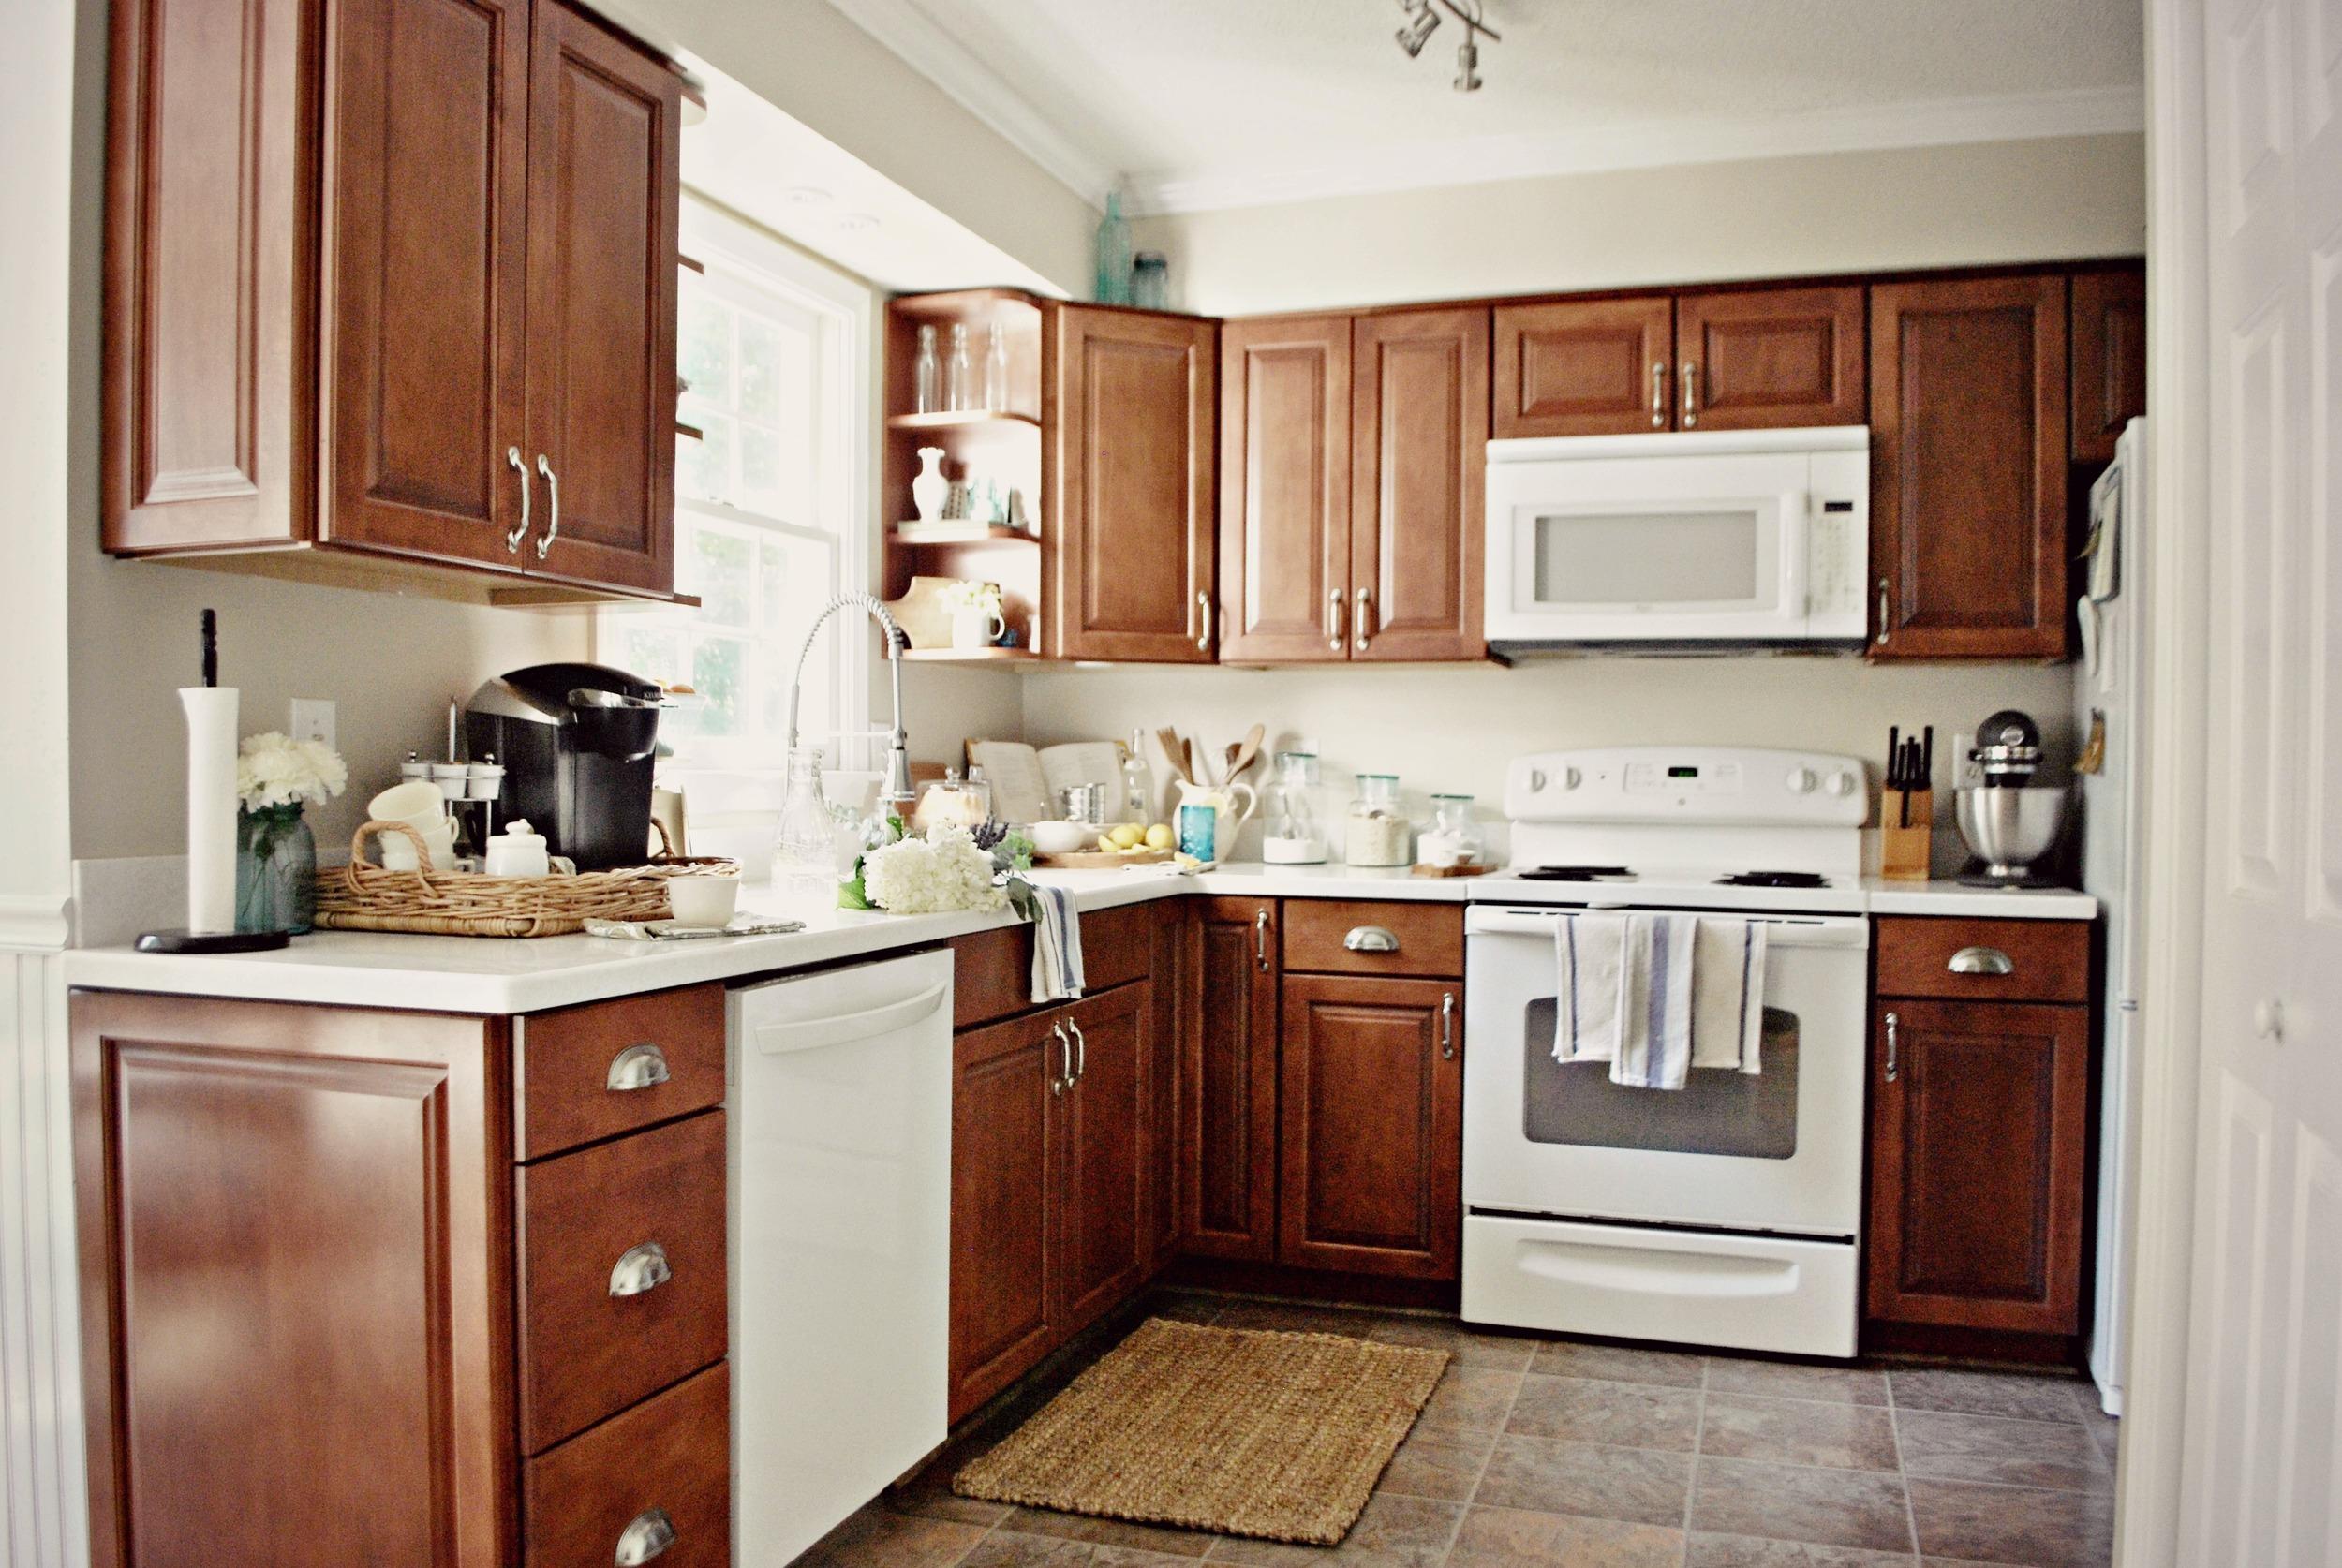 Plum Pretty Decor & Design Co.Painted Kitchen Cabinets ...